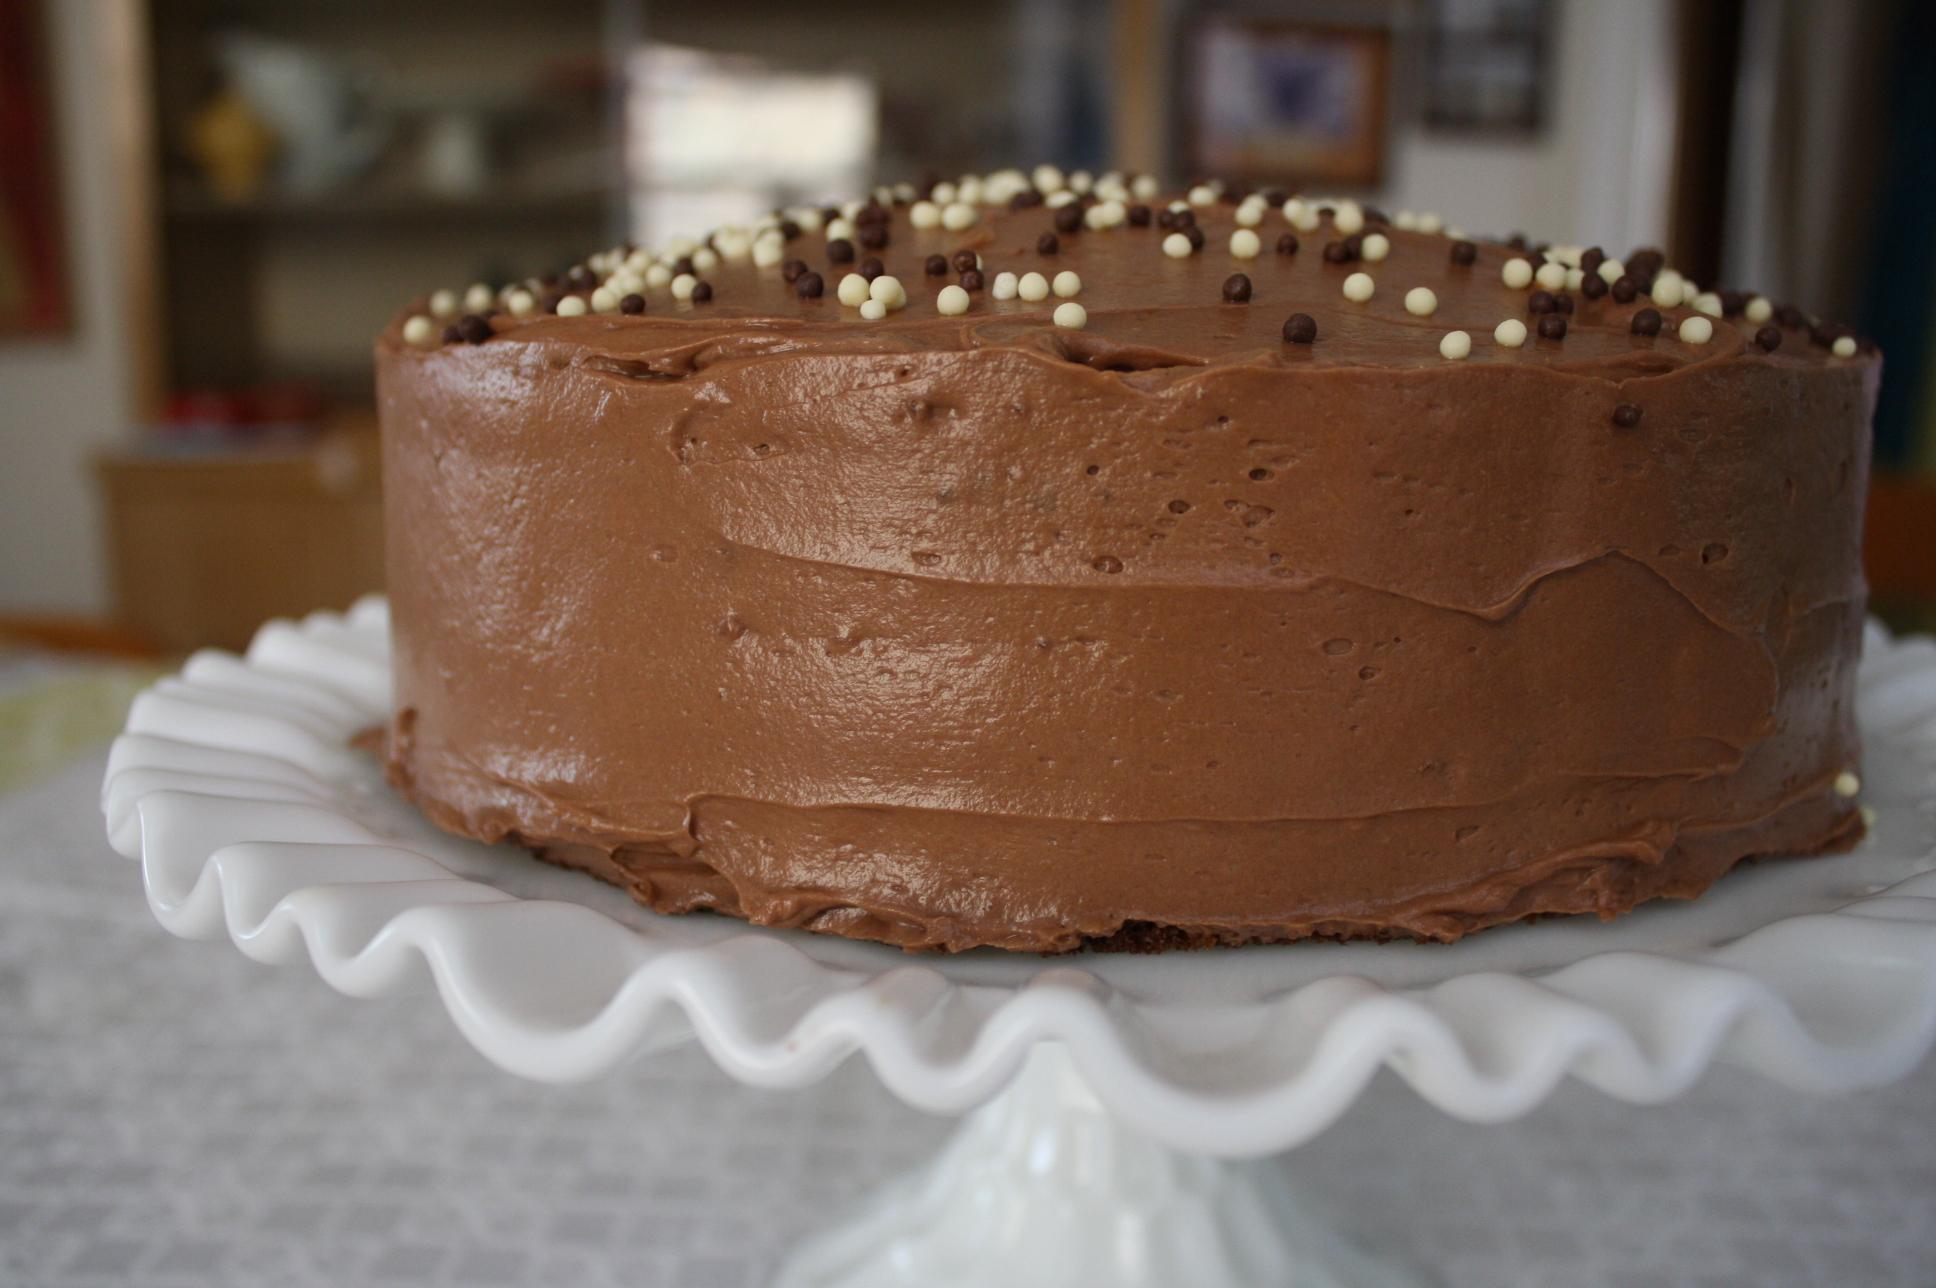 World Best Cake Images Hd : World s Best Chocolate Cake Sweet & Savory Kitchens